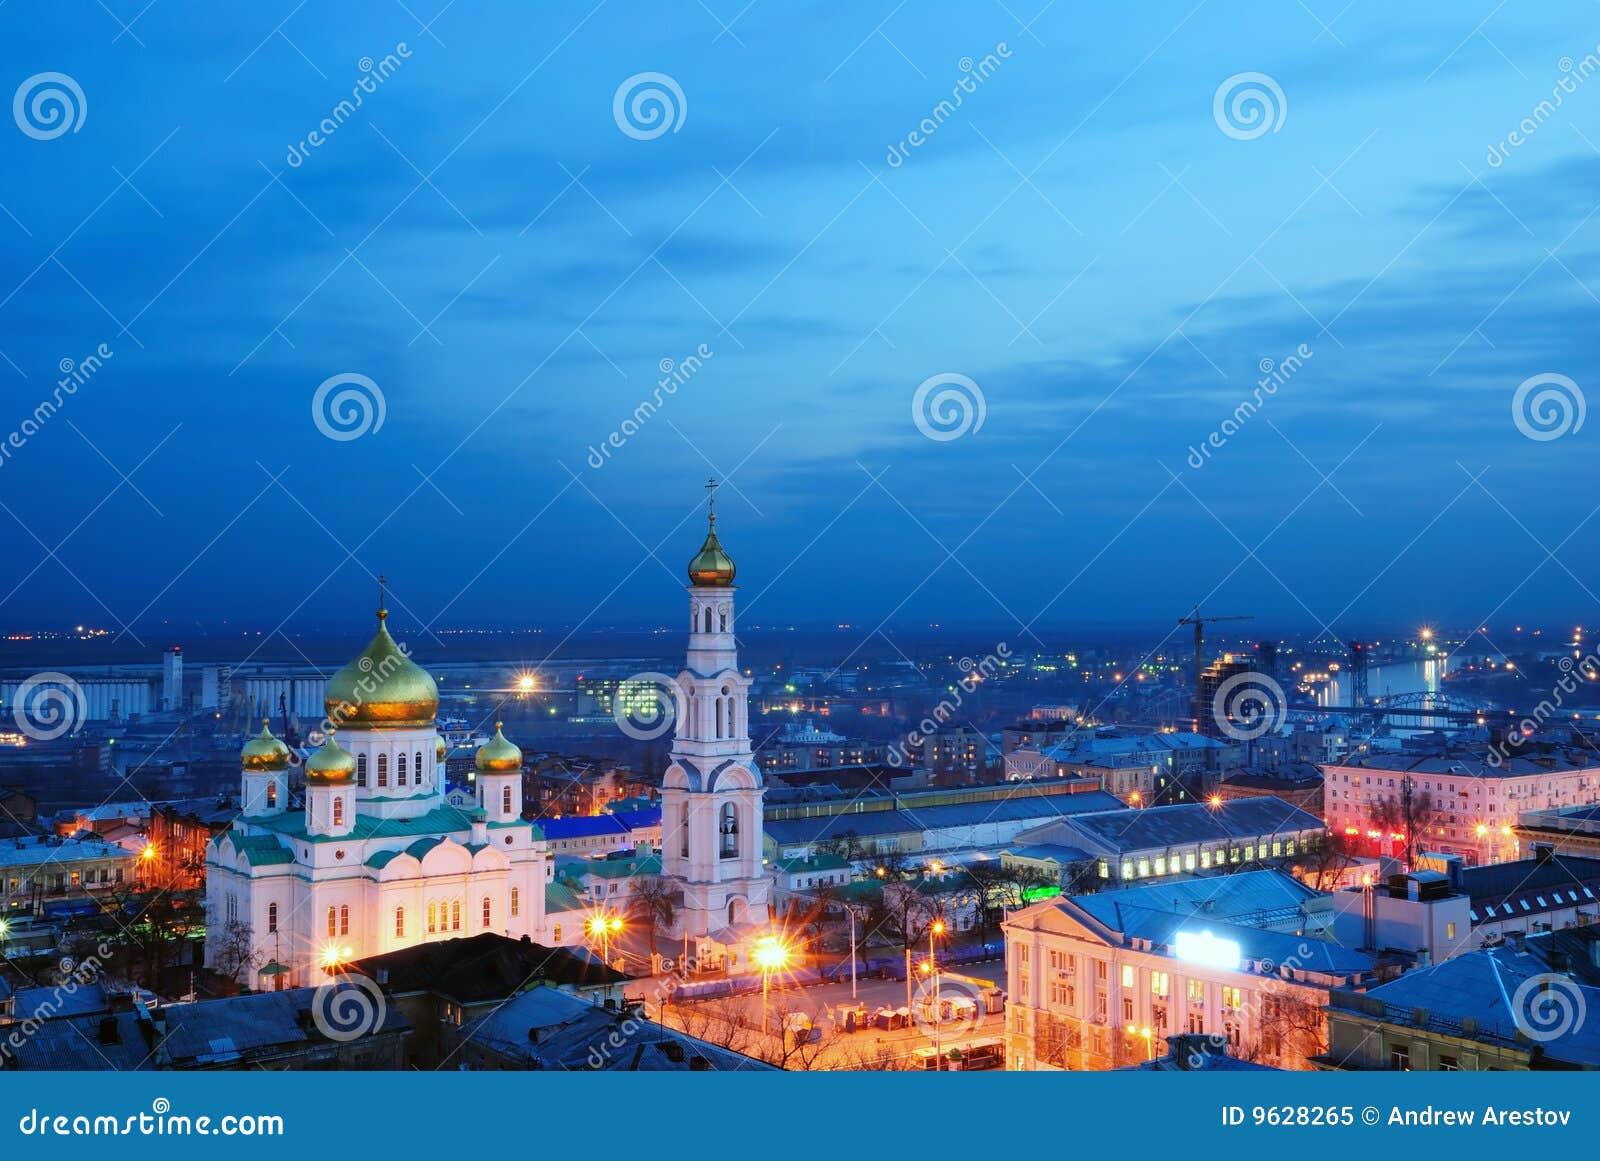 Cathédrale. Rostov-on-Don.